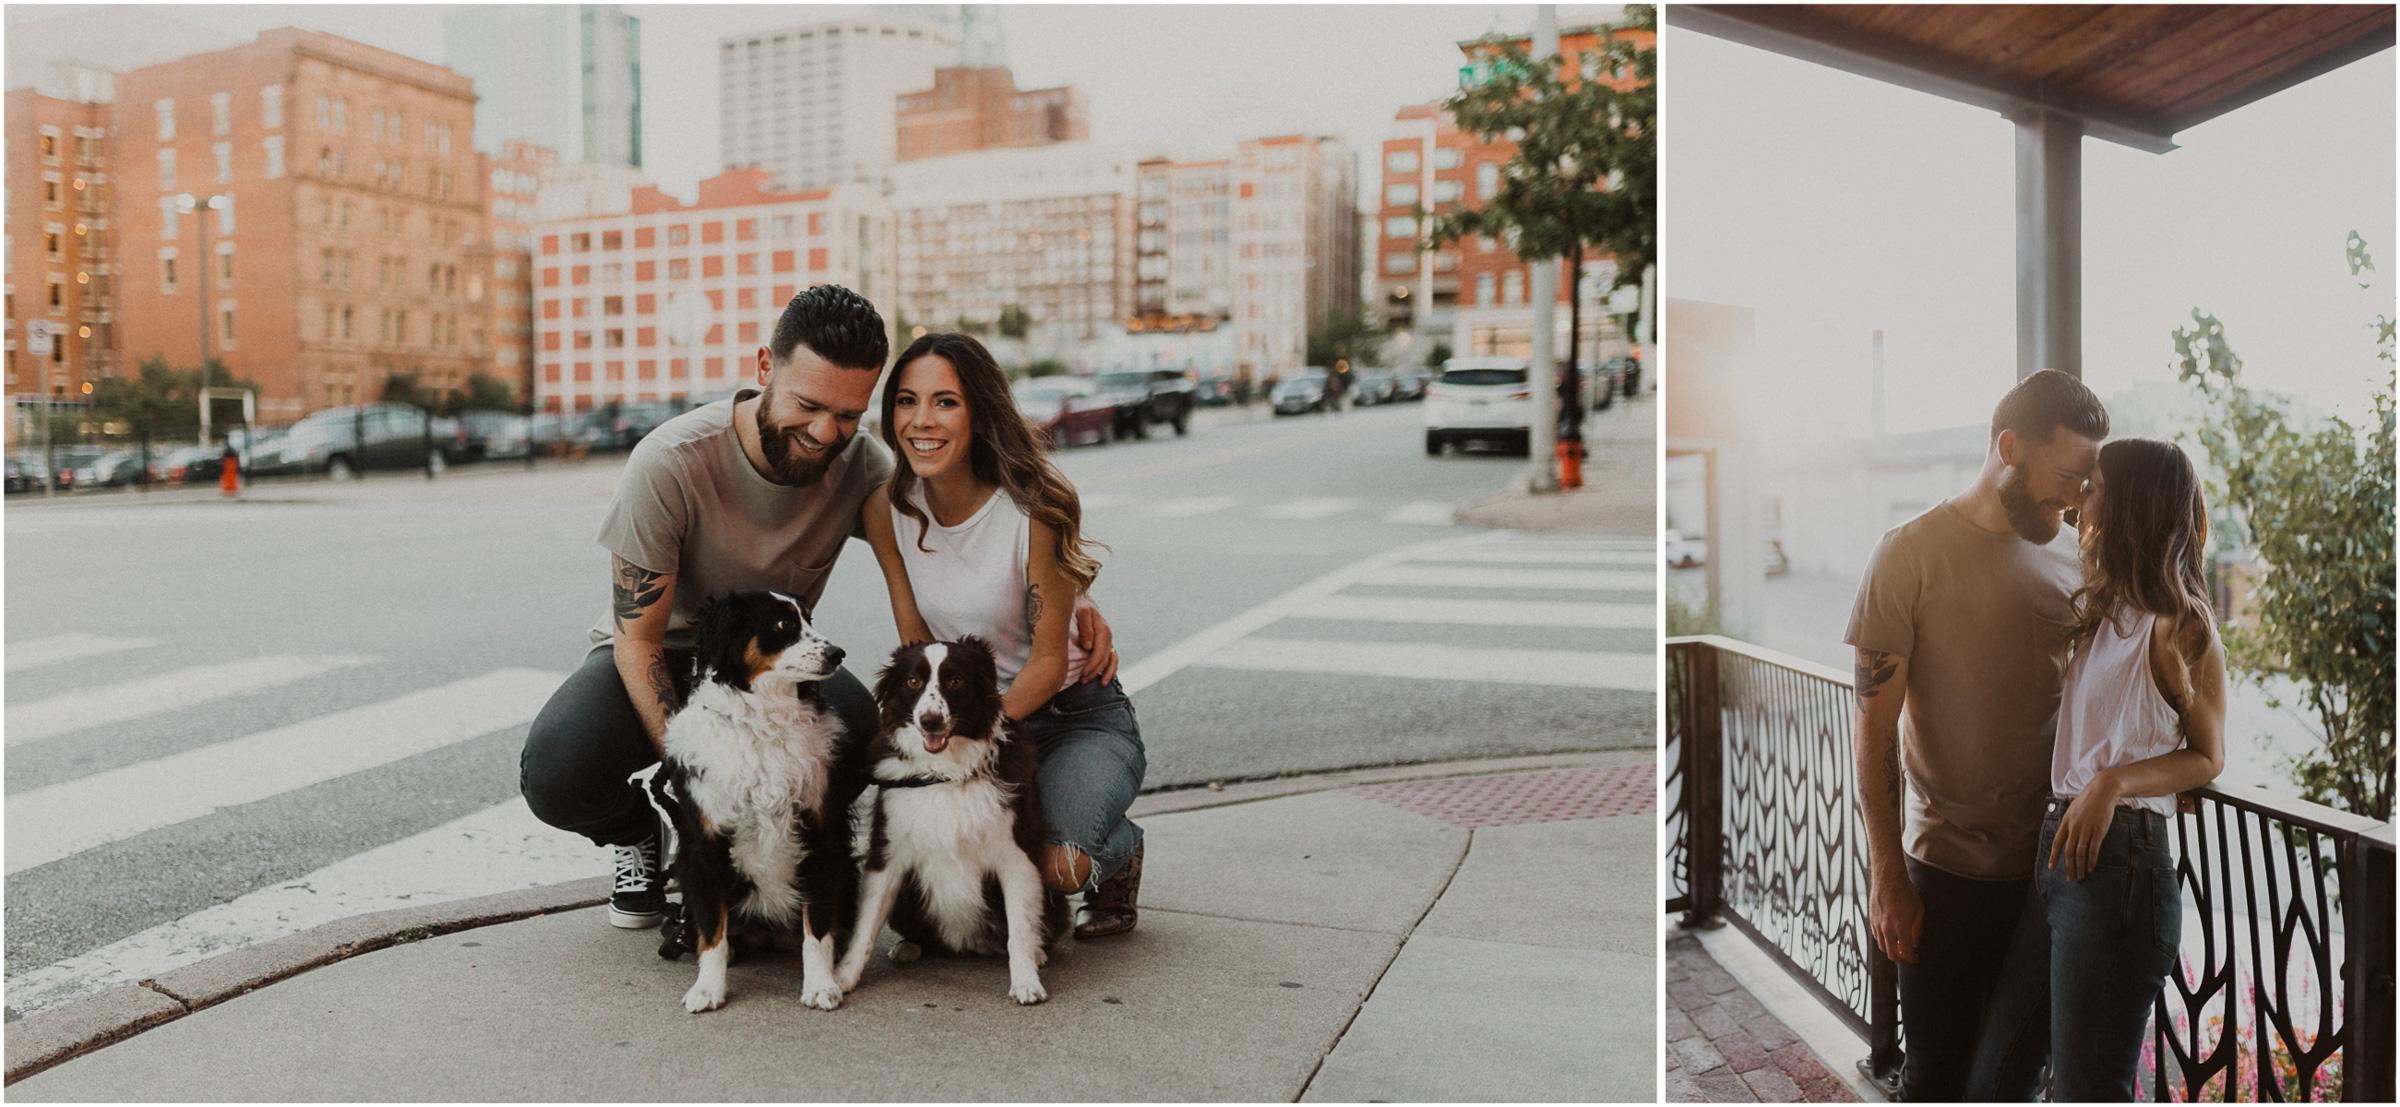 alyssa barletter photography downtown kansas city photos with couple and aussies austrailian shepards-17.jpg